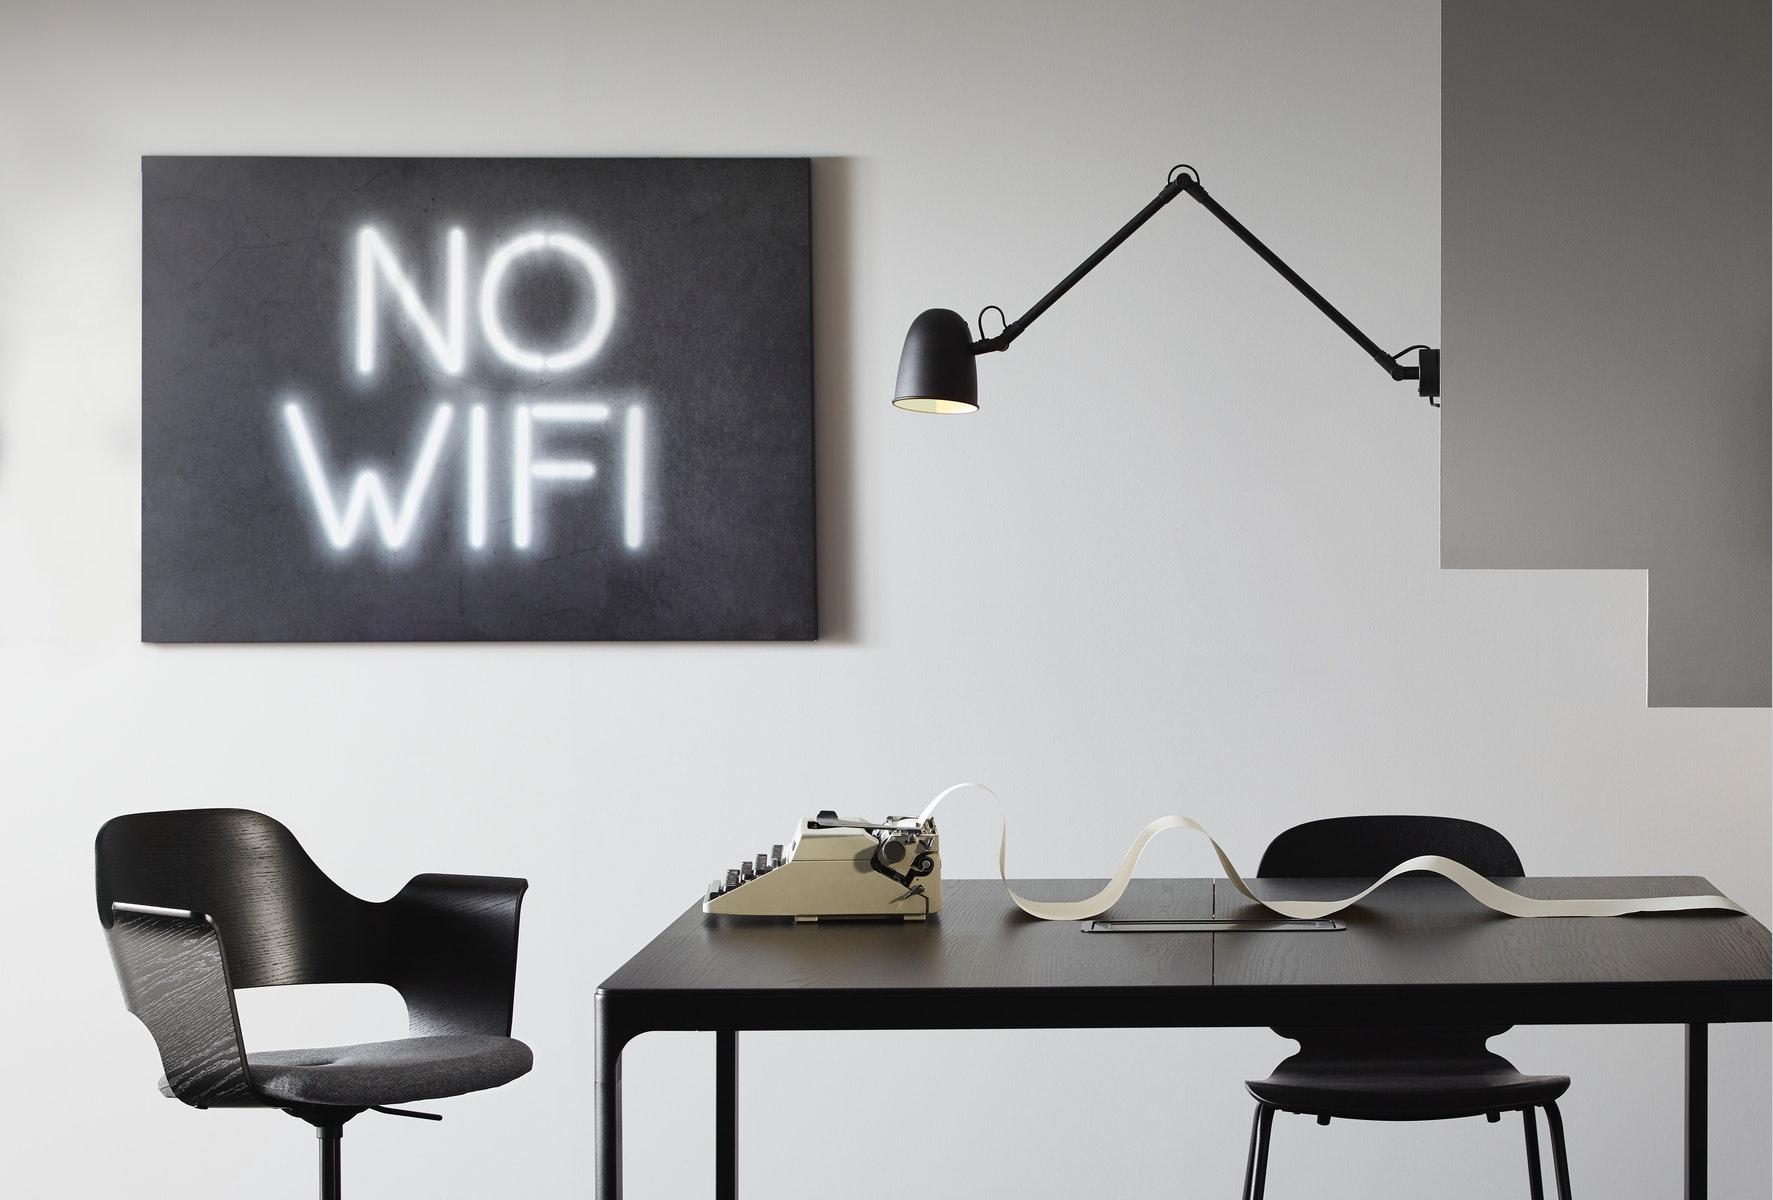 BJÖRKSTA畫以深色背景襯托以白色螢光管拼湊的「No wifi」字樣。